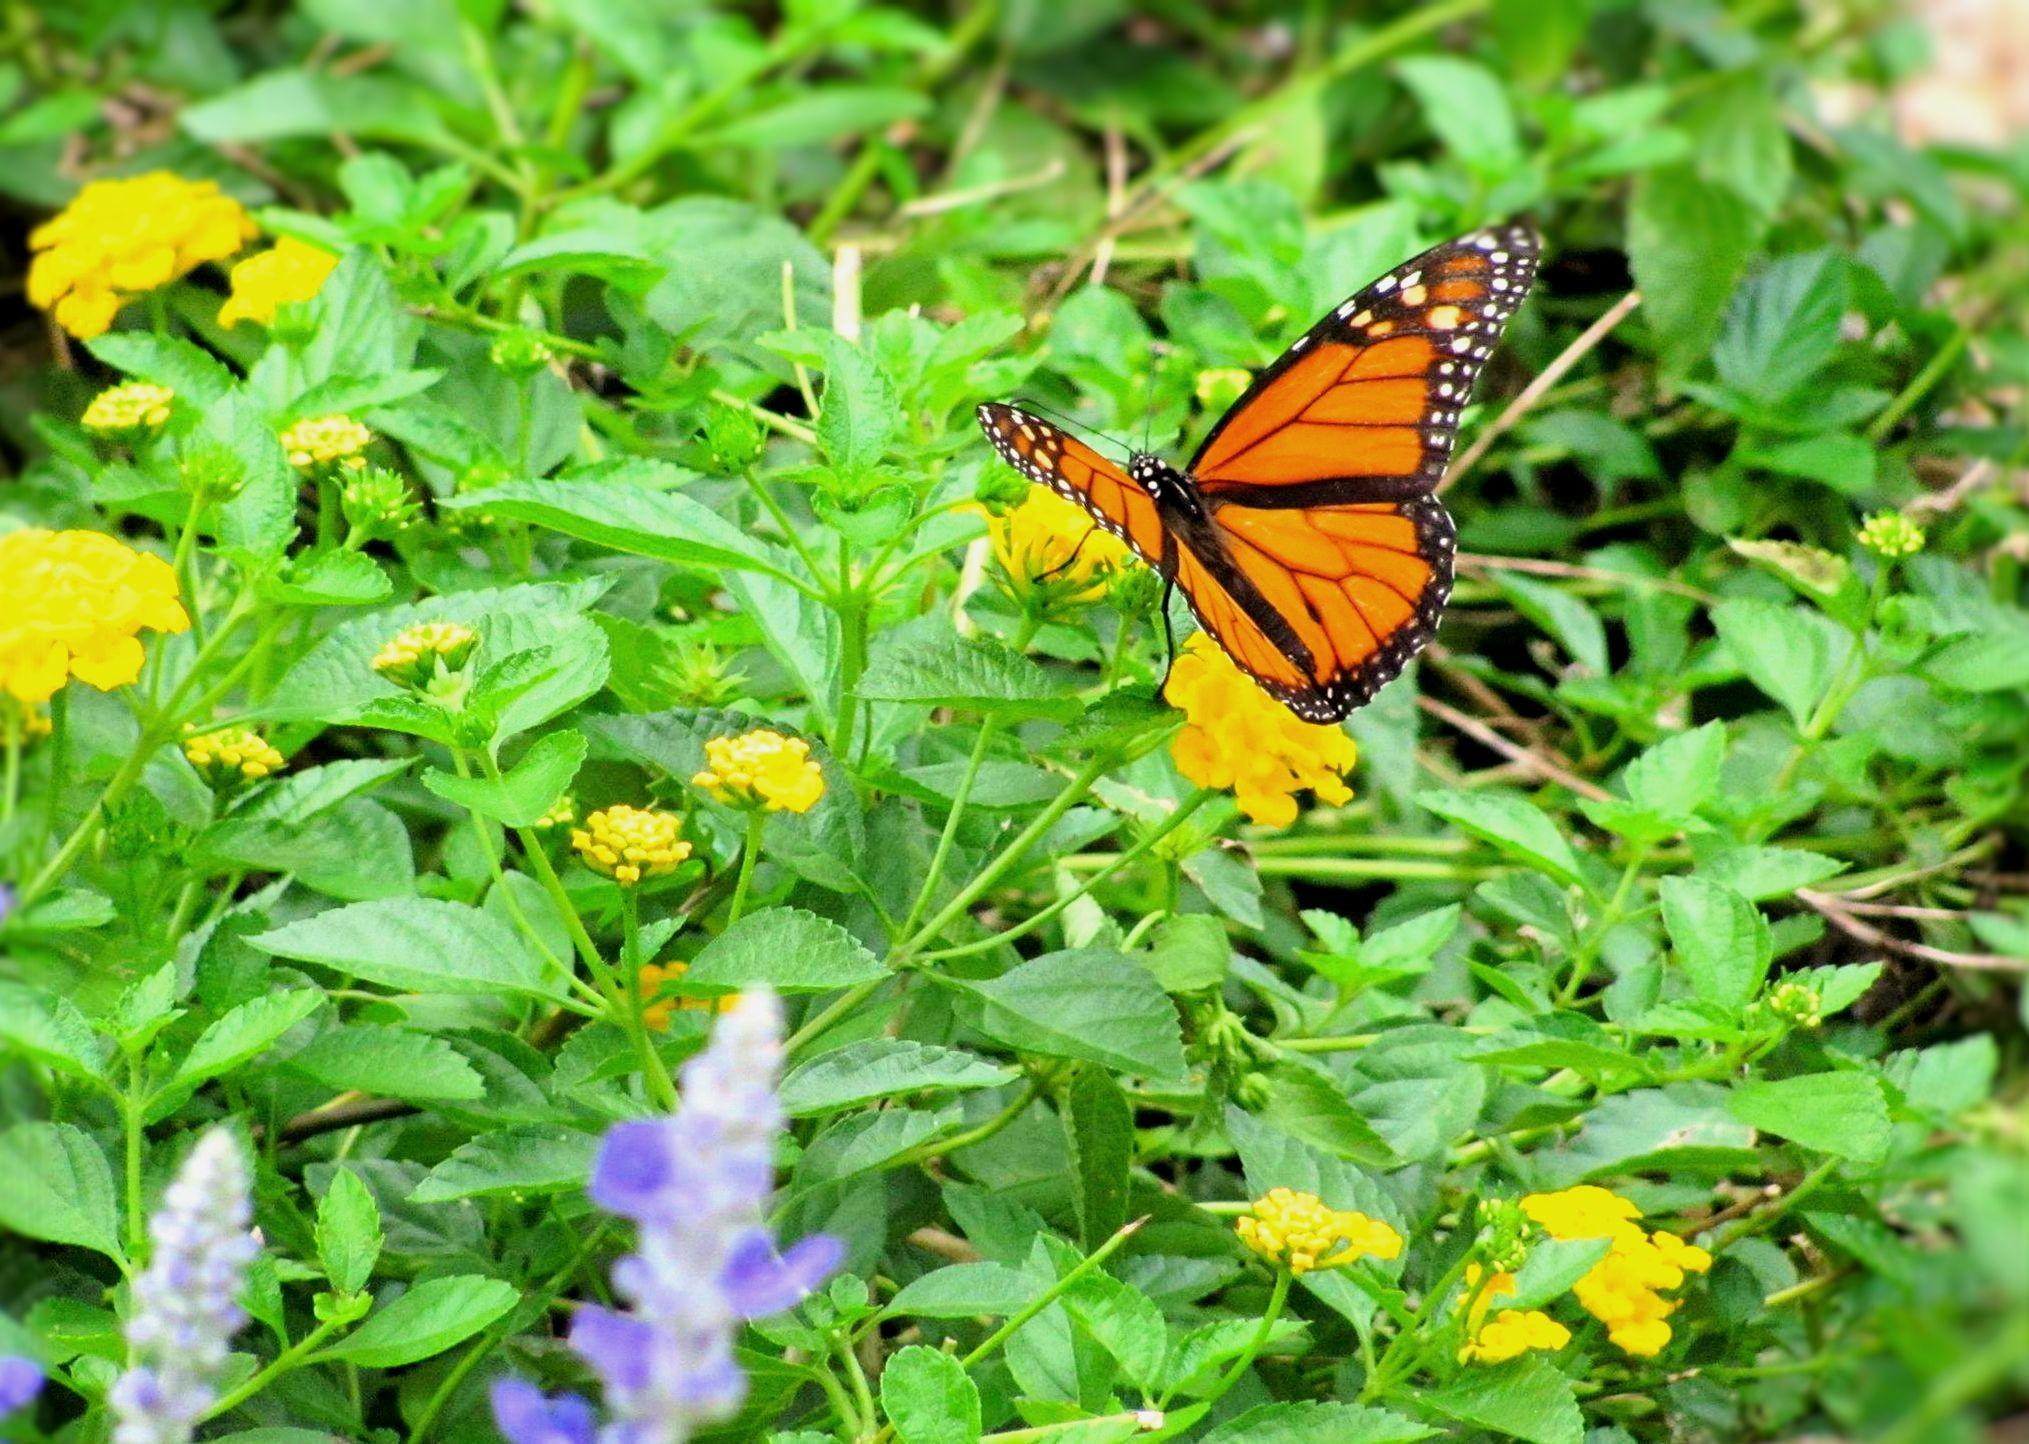 Yellow Butterfly Flowers Garden Bugs Conservatory Wallpaper - Monarch Butterfly , HD Wallpaper & Backgrounds